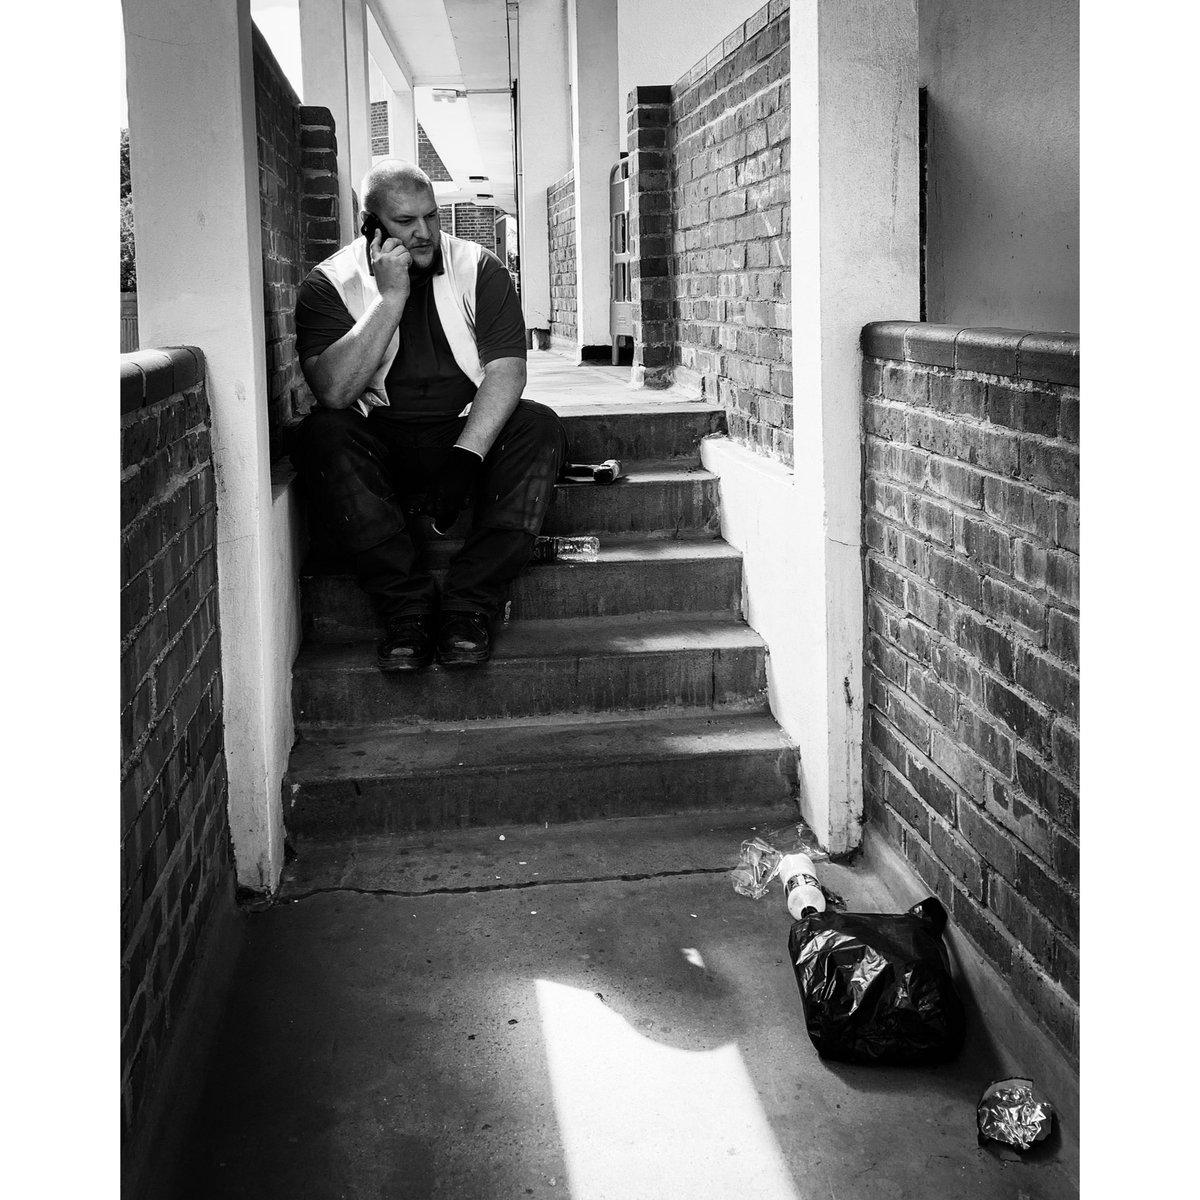 #streetphotography #photooftheday #photography #London #workman #iPhone #iphonephotography #tuesdayvibespic.twitter.com/WR4RPanegF